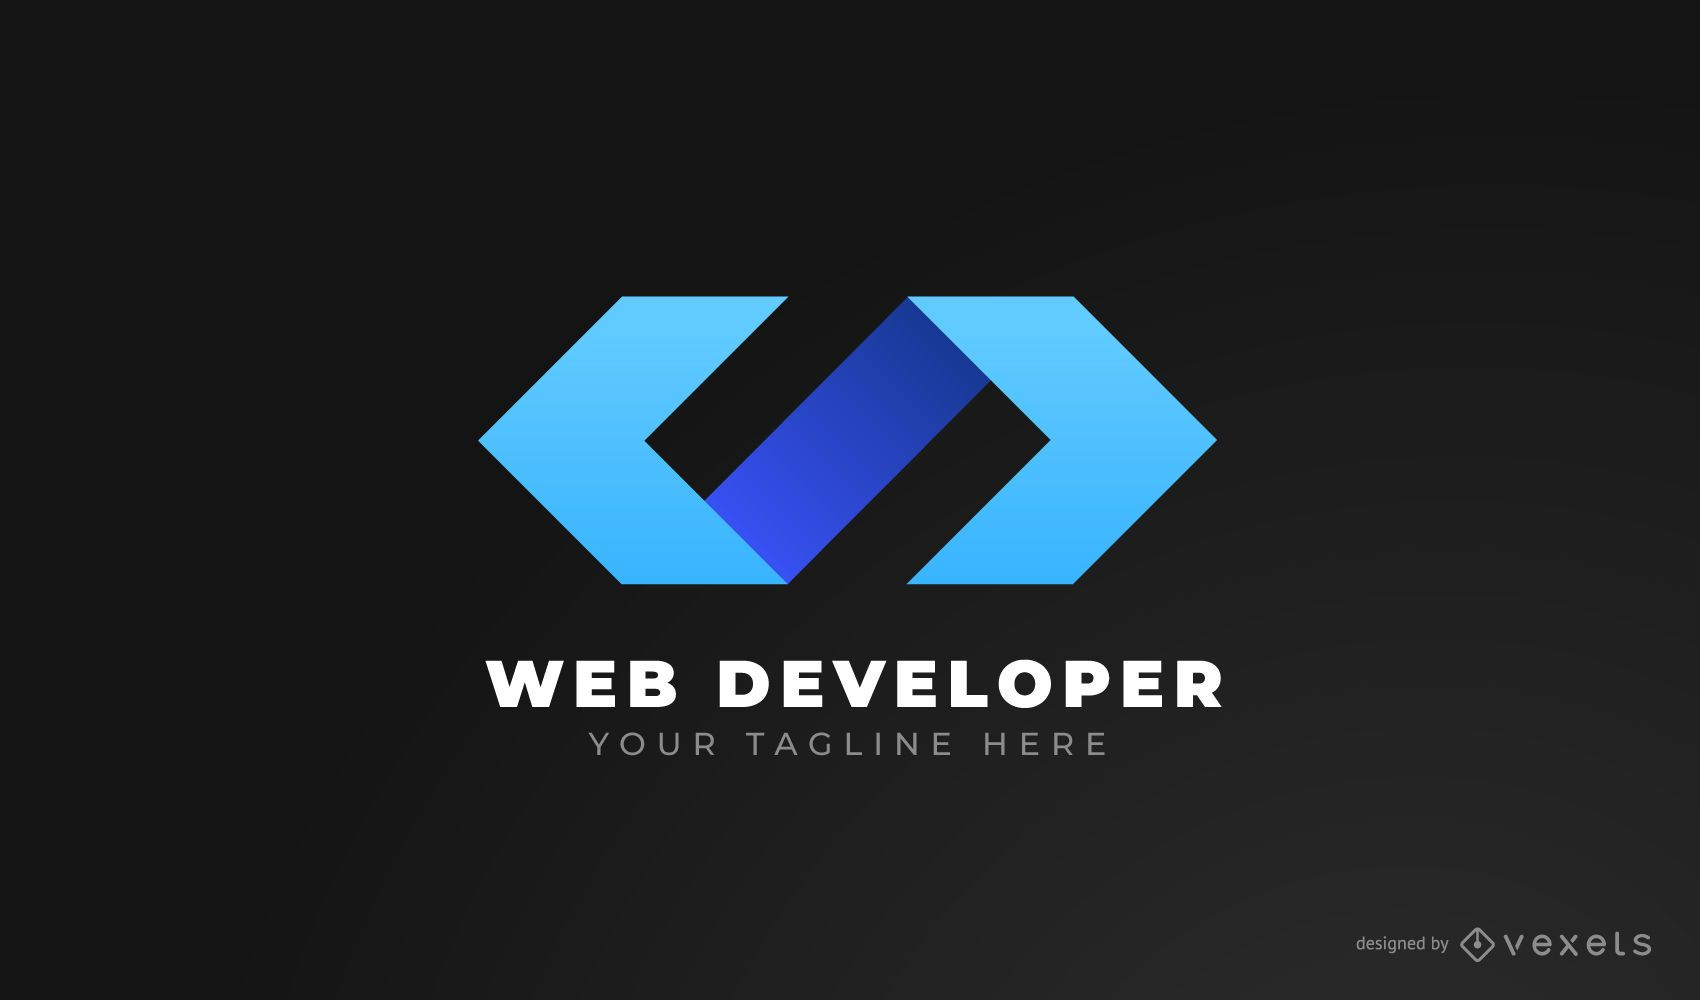 Web Developer Logo Design